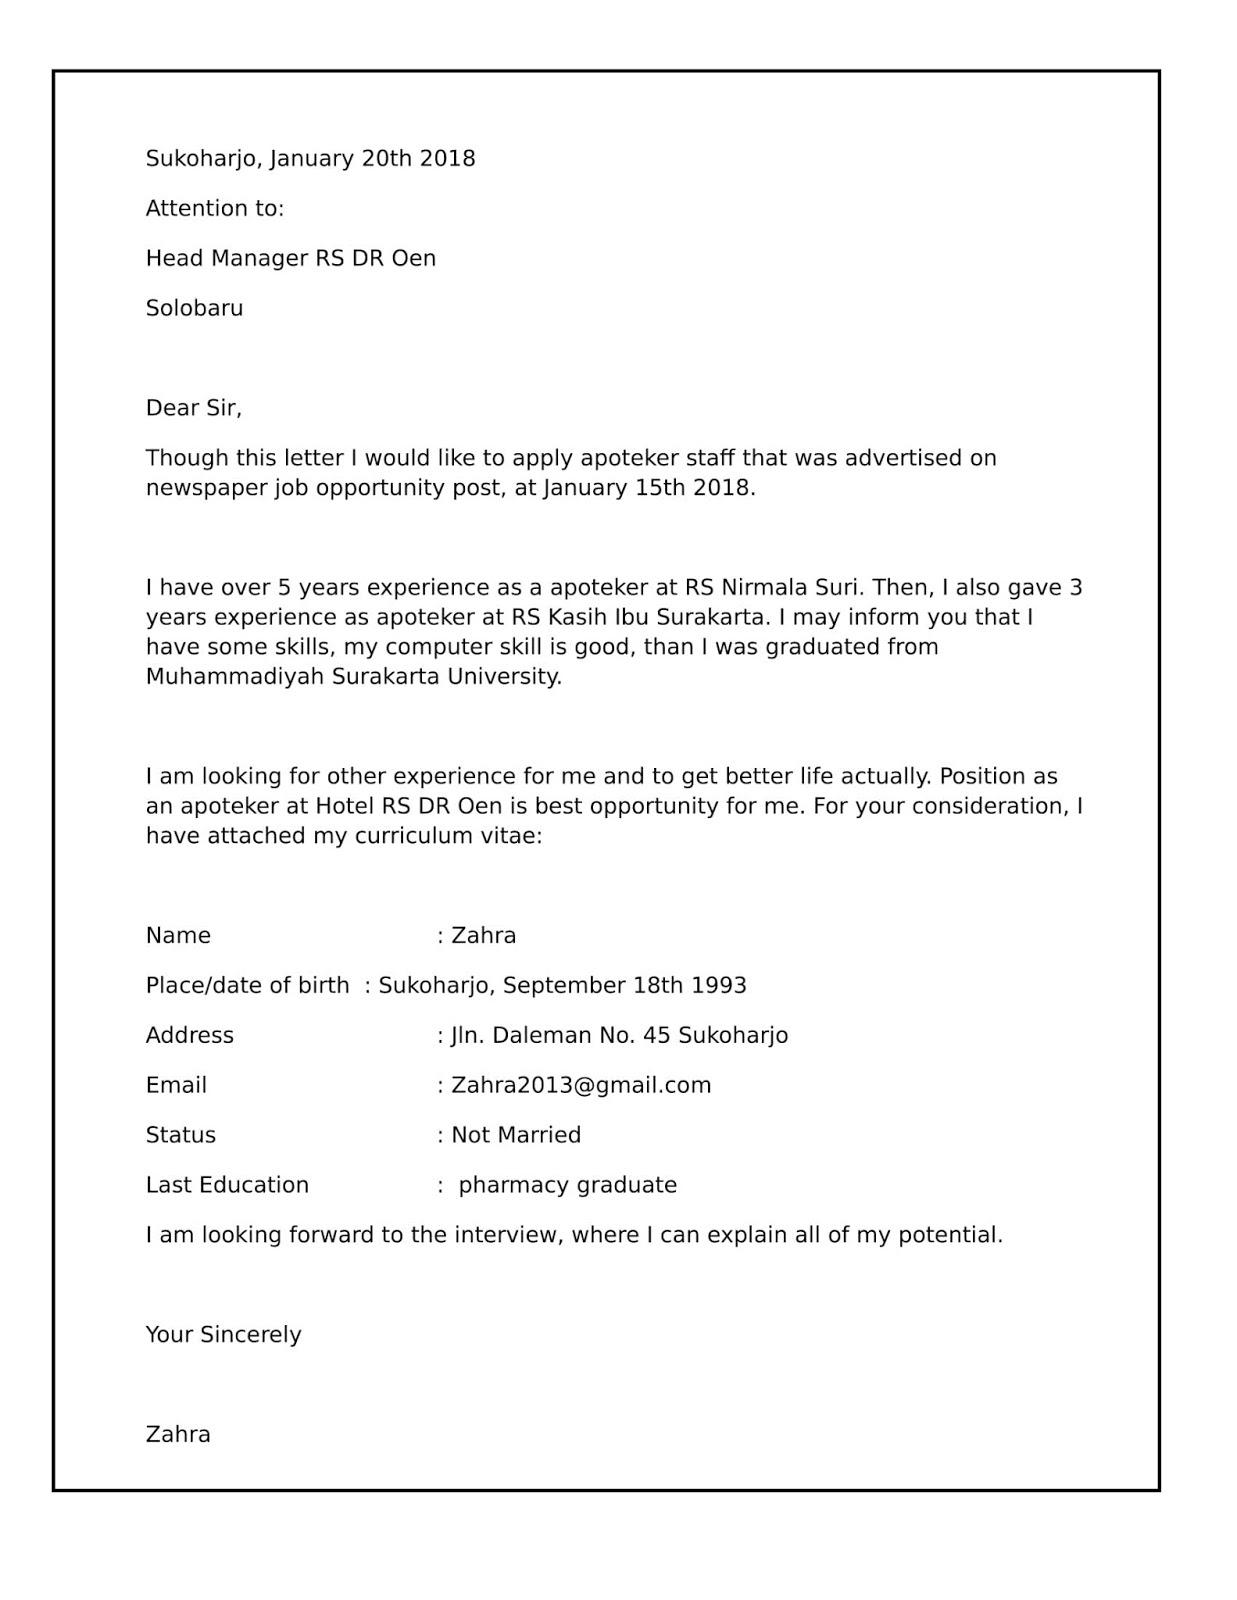 Contoh Surat Lamaran Kerja Cv Dalam Bahasa Inggris Best Resume Examples